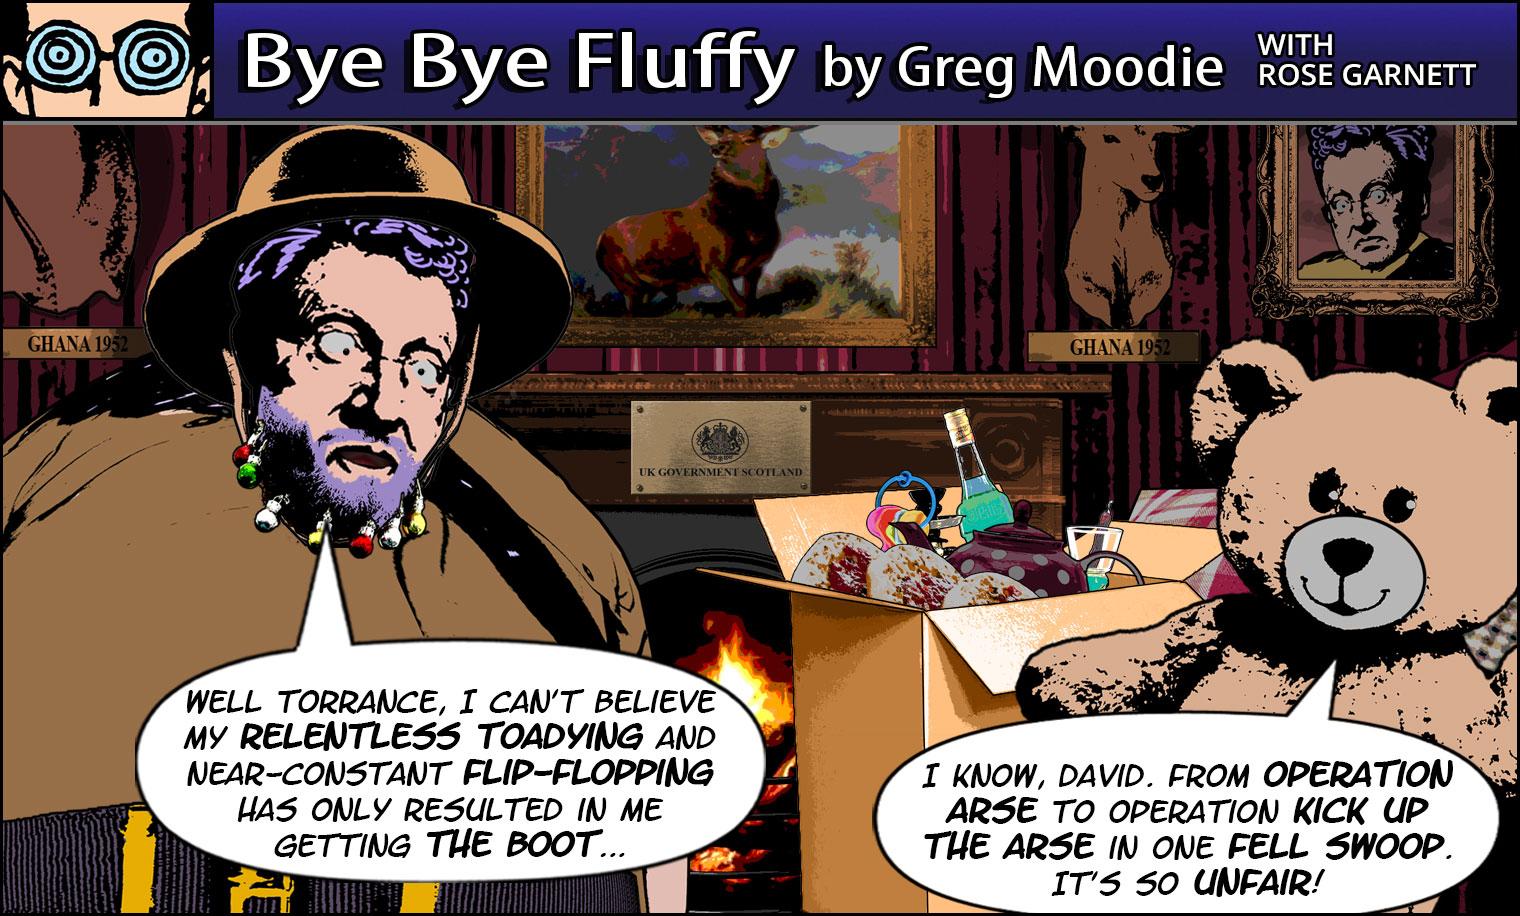 Bye Bye Fluffy